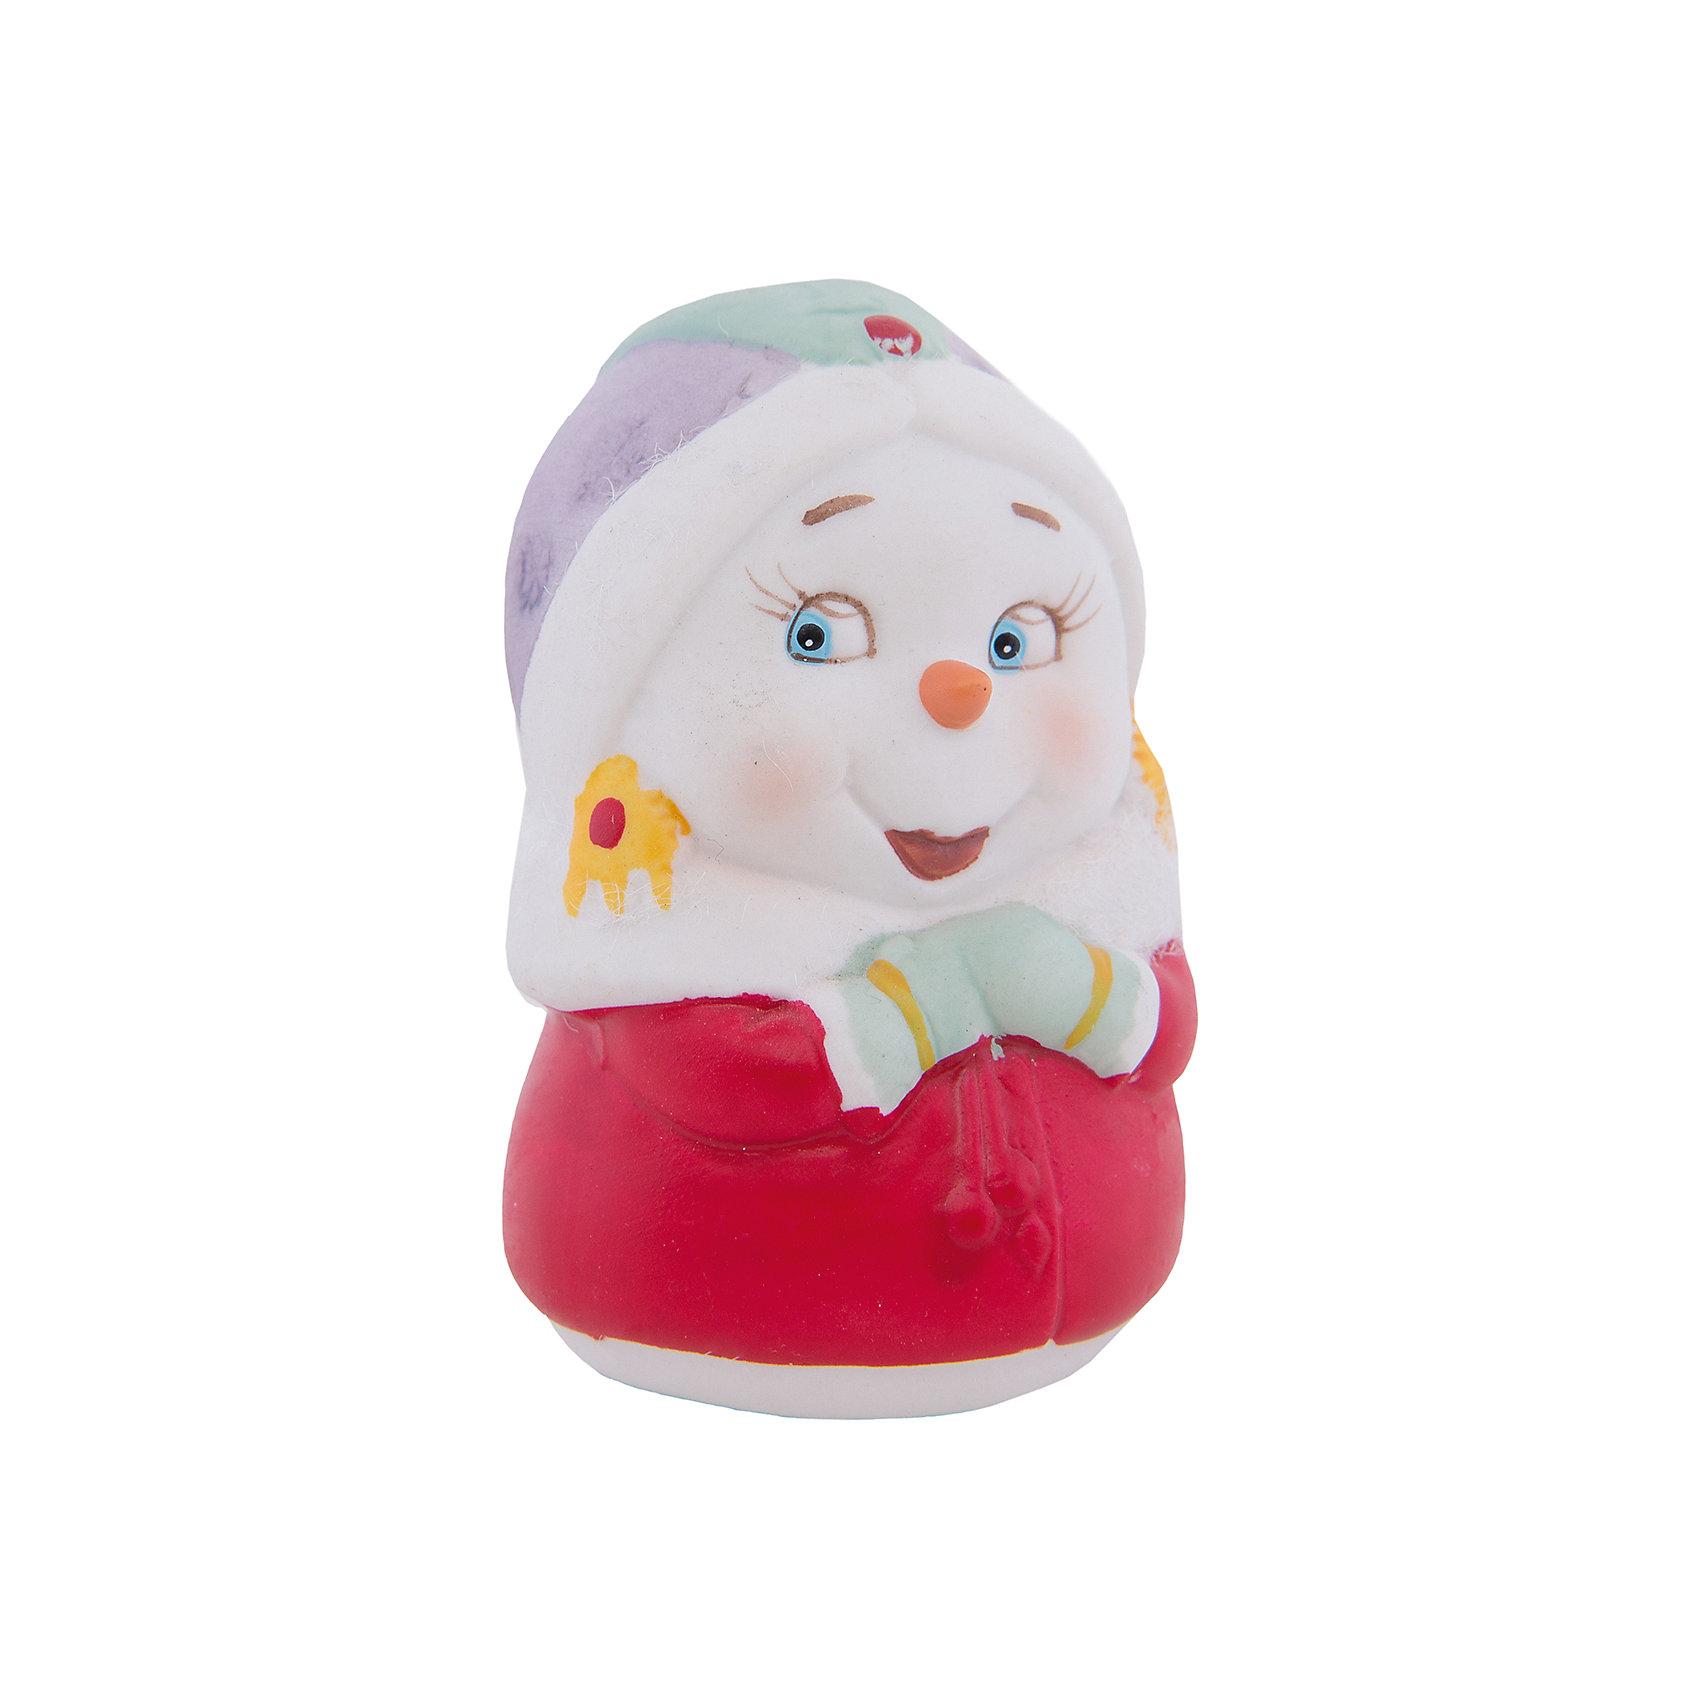 Феникс-Презент Новогодняя фигурка снеговика Снеговик-девушка compatible projector lamp for benq 5j j1v05 001 mp525p mp575 mp576